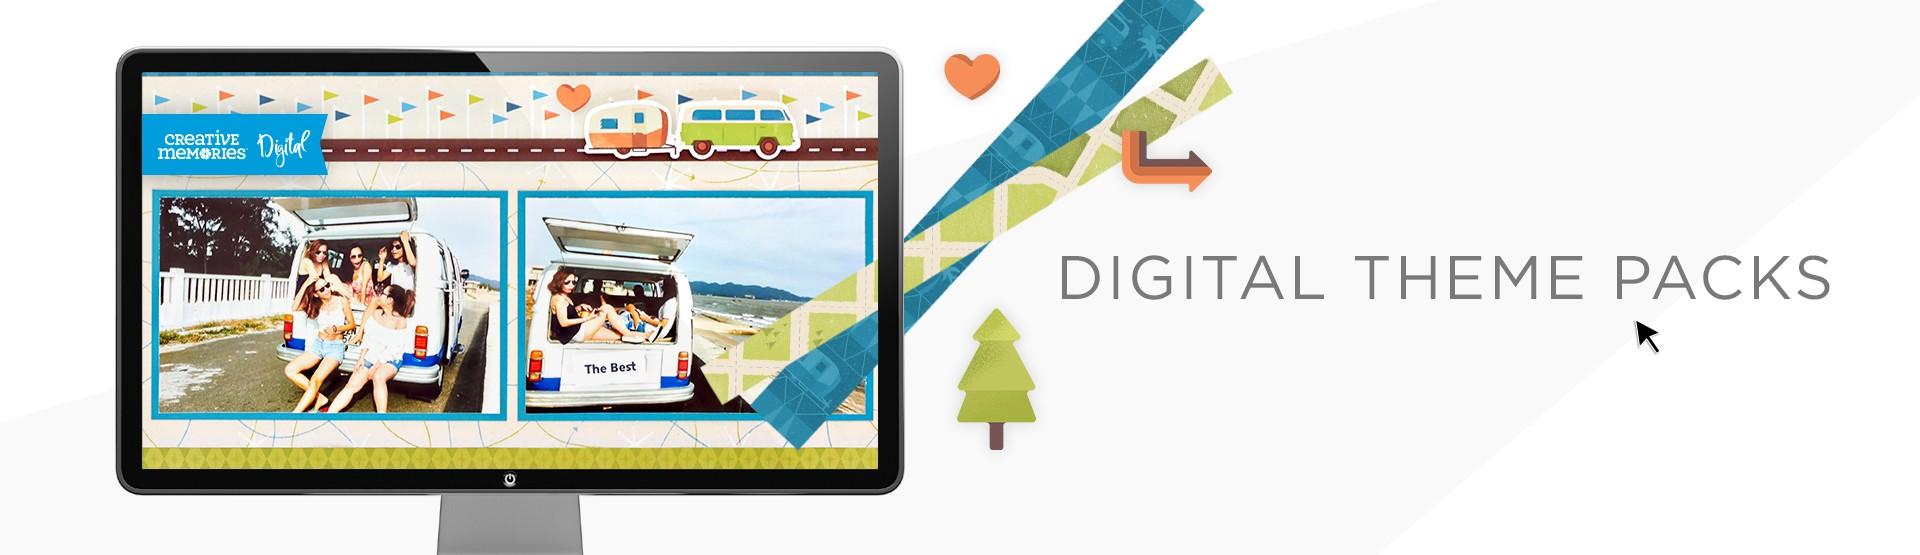 Digital Scrapbooking Kits: Theme Packs